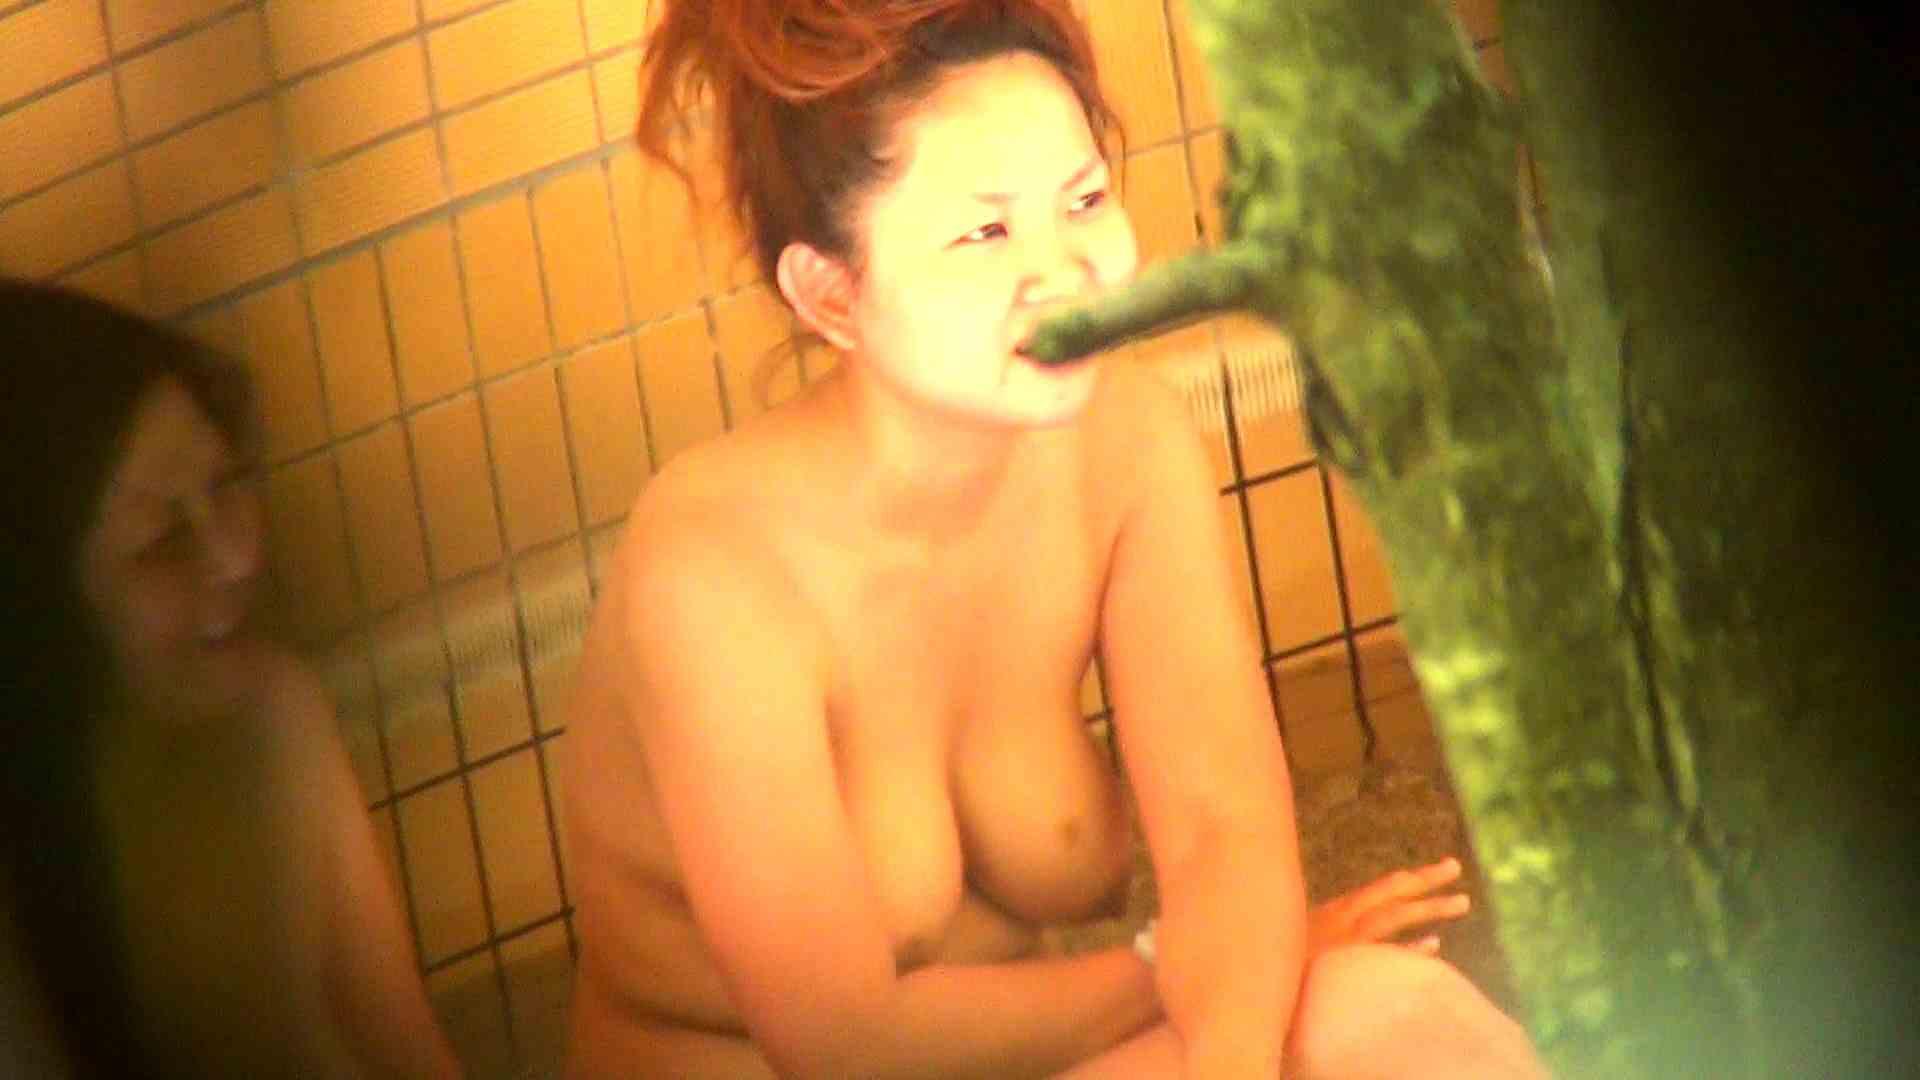 Aquaな露天風呂Vol.267 盗撮   HなOL  91pic 76